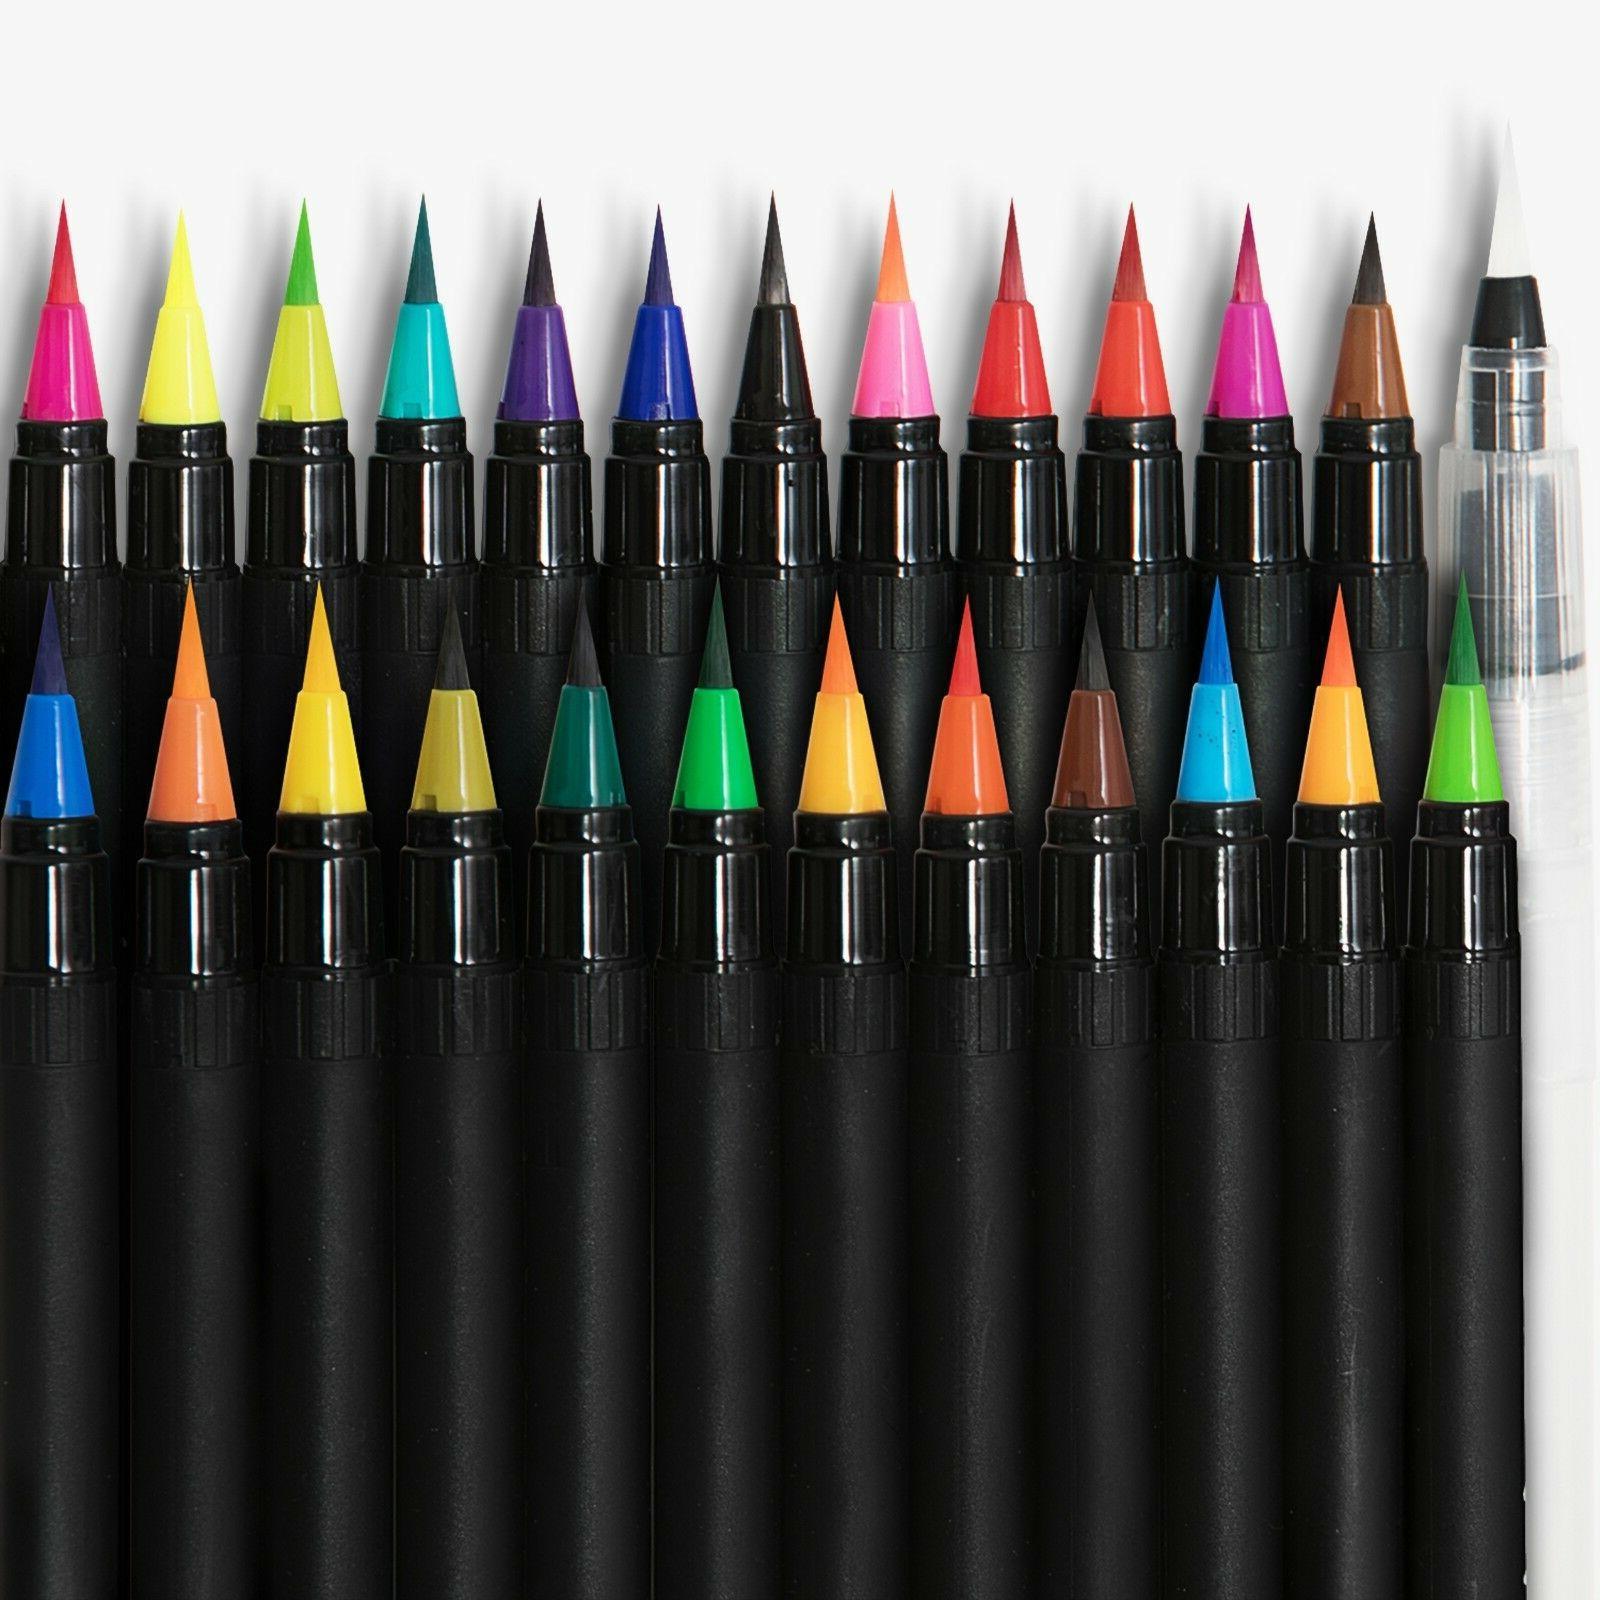 Watercolor Paint Brush Tips Professional Set